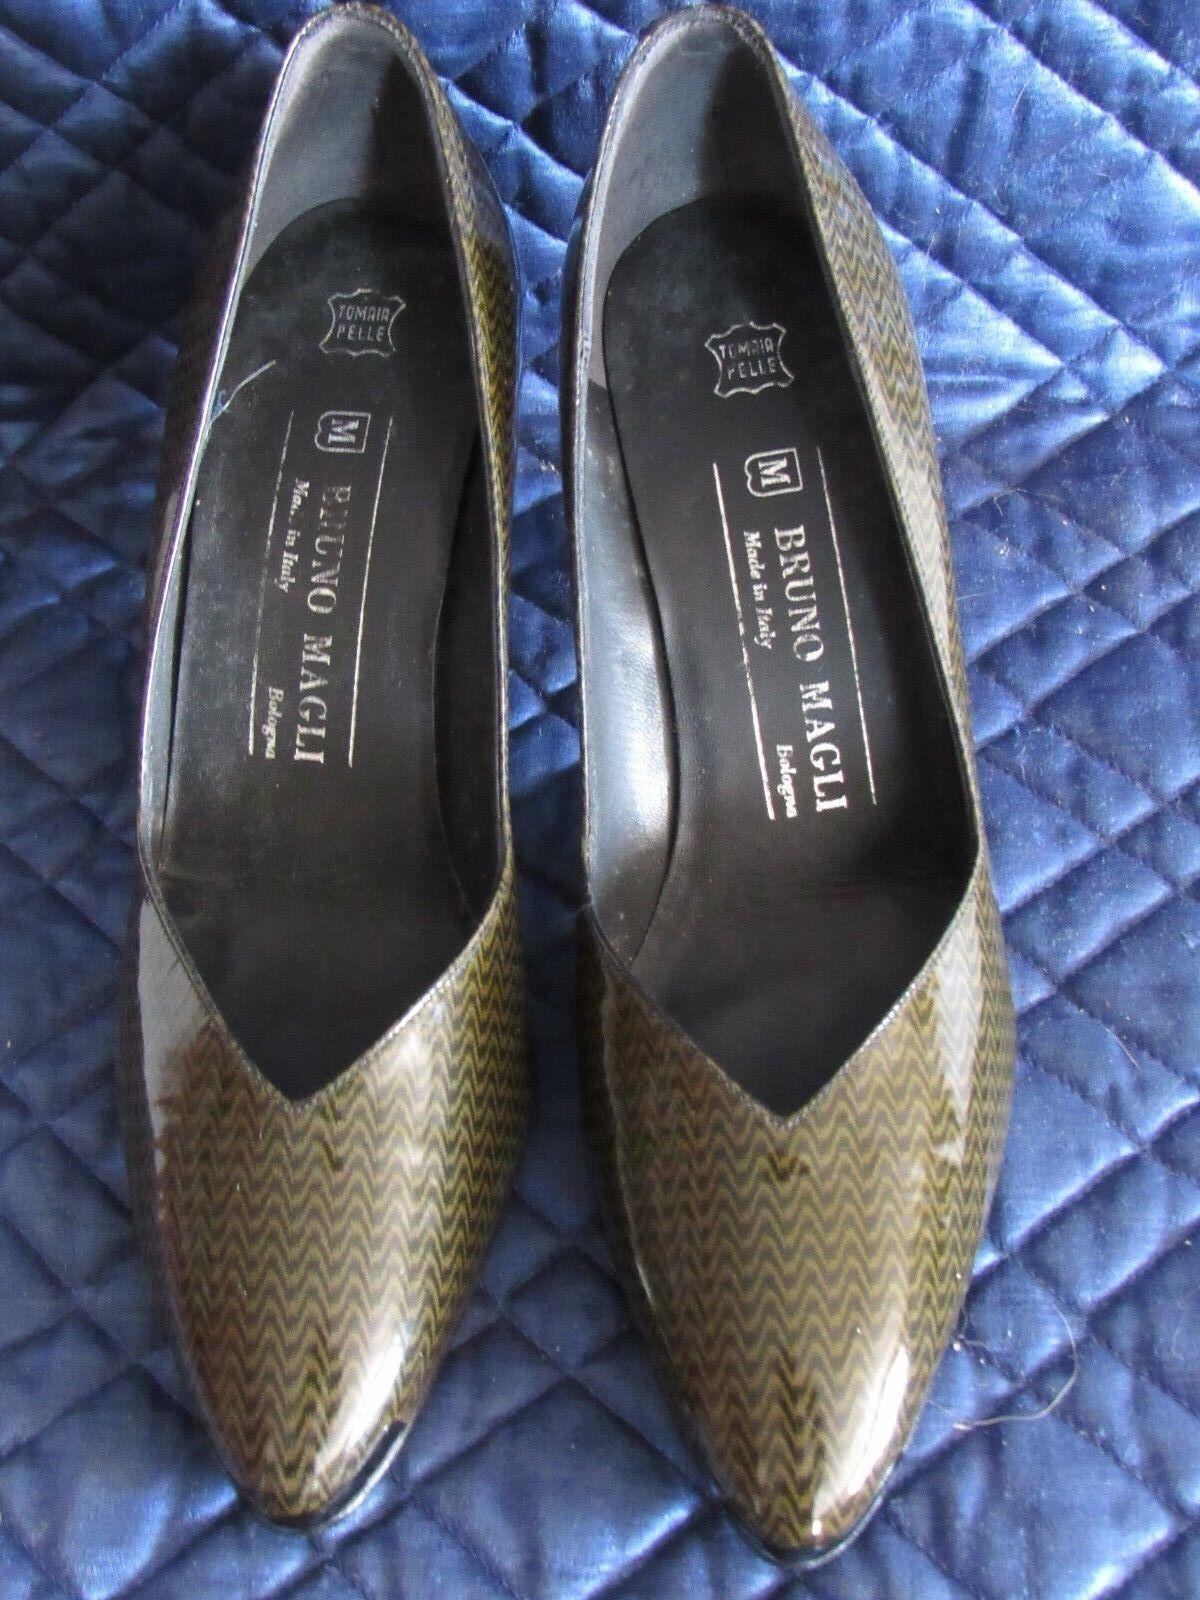 supporto al dettaglio all'ingrosso BRUNO MAGLI Patent Leather Argyle Pointed Toes Heels Heels Heels Pumps 7.5 AA ITALY - NIB  marchi di moda